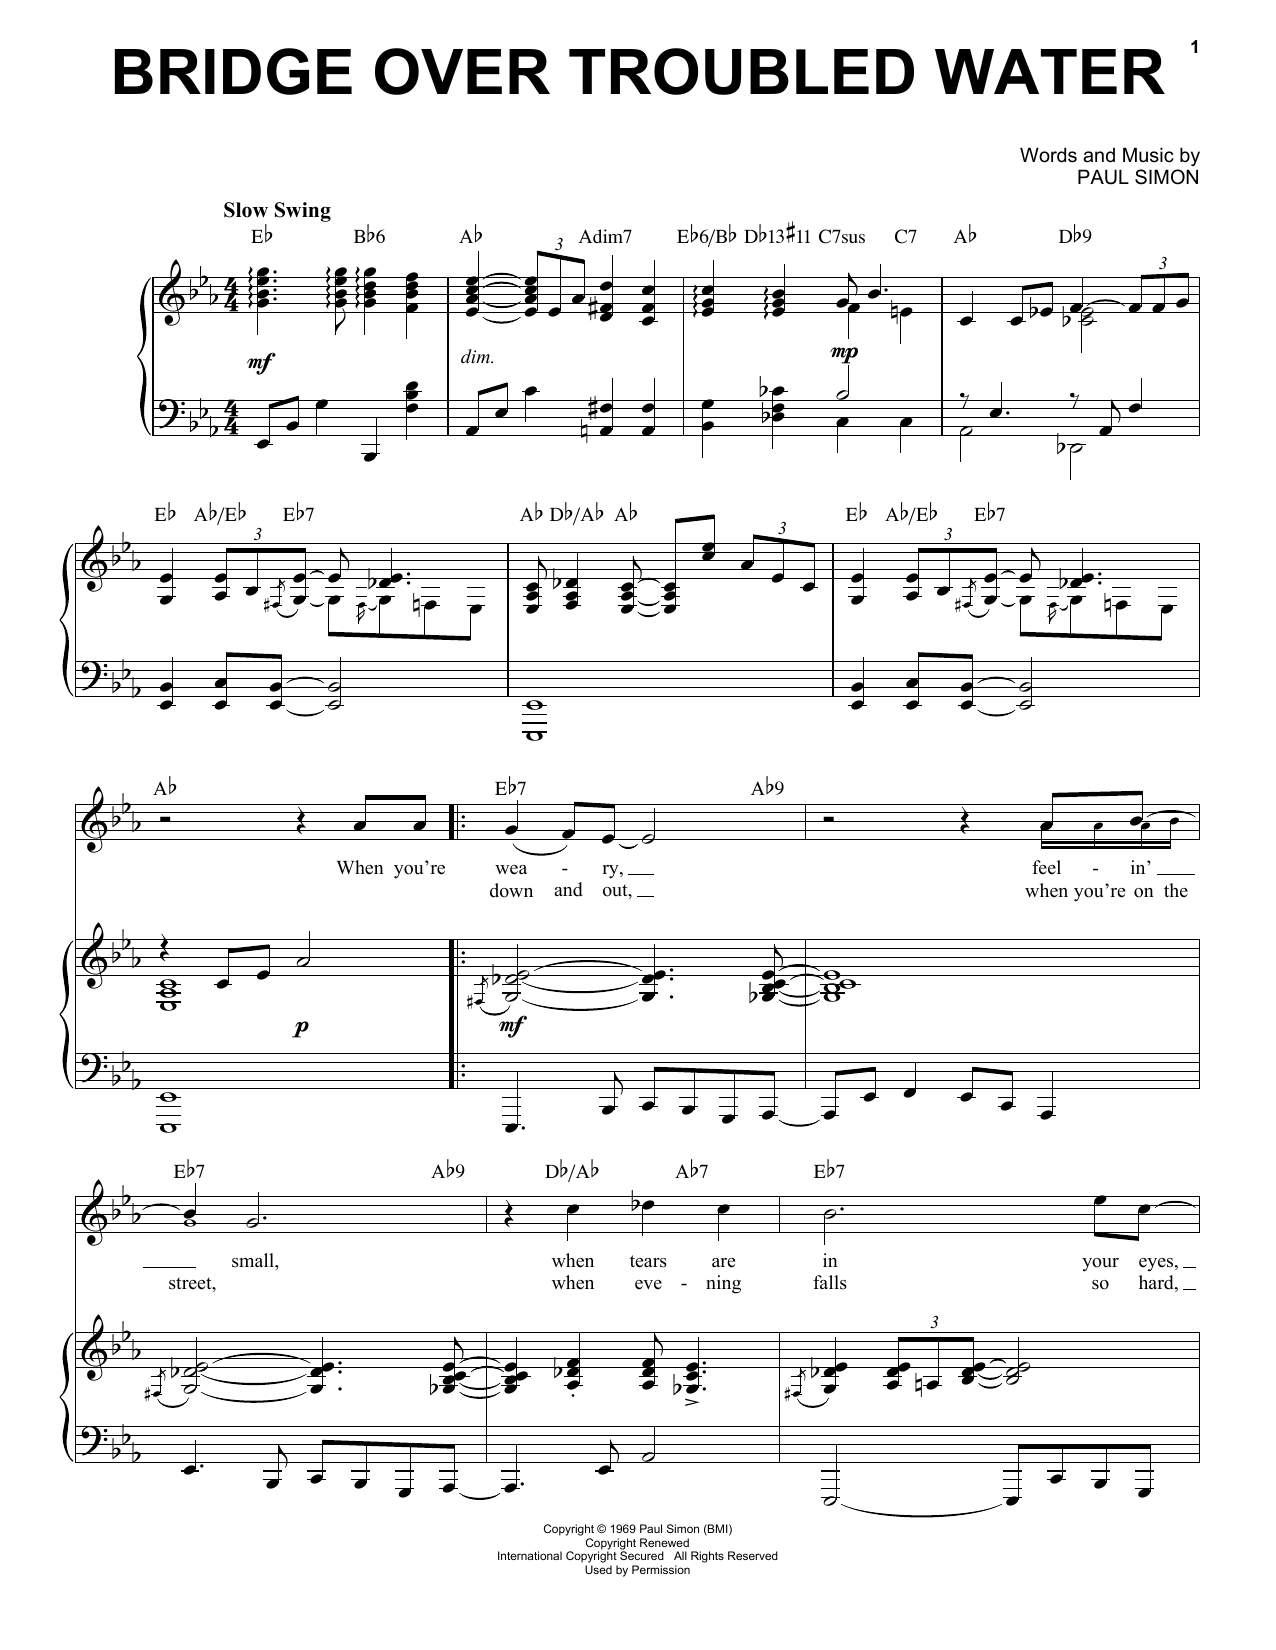 Simon & Garfunkel Bridge Over Troubled Water [Jazz version] (arr. Brent Edstrom) sheet music notes and chords. Download Printable PDF.